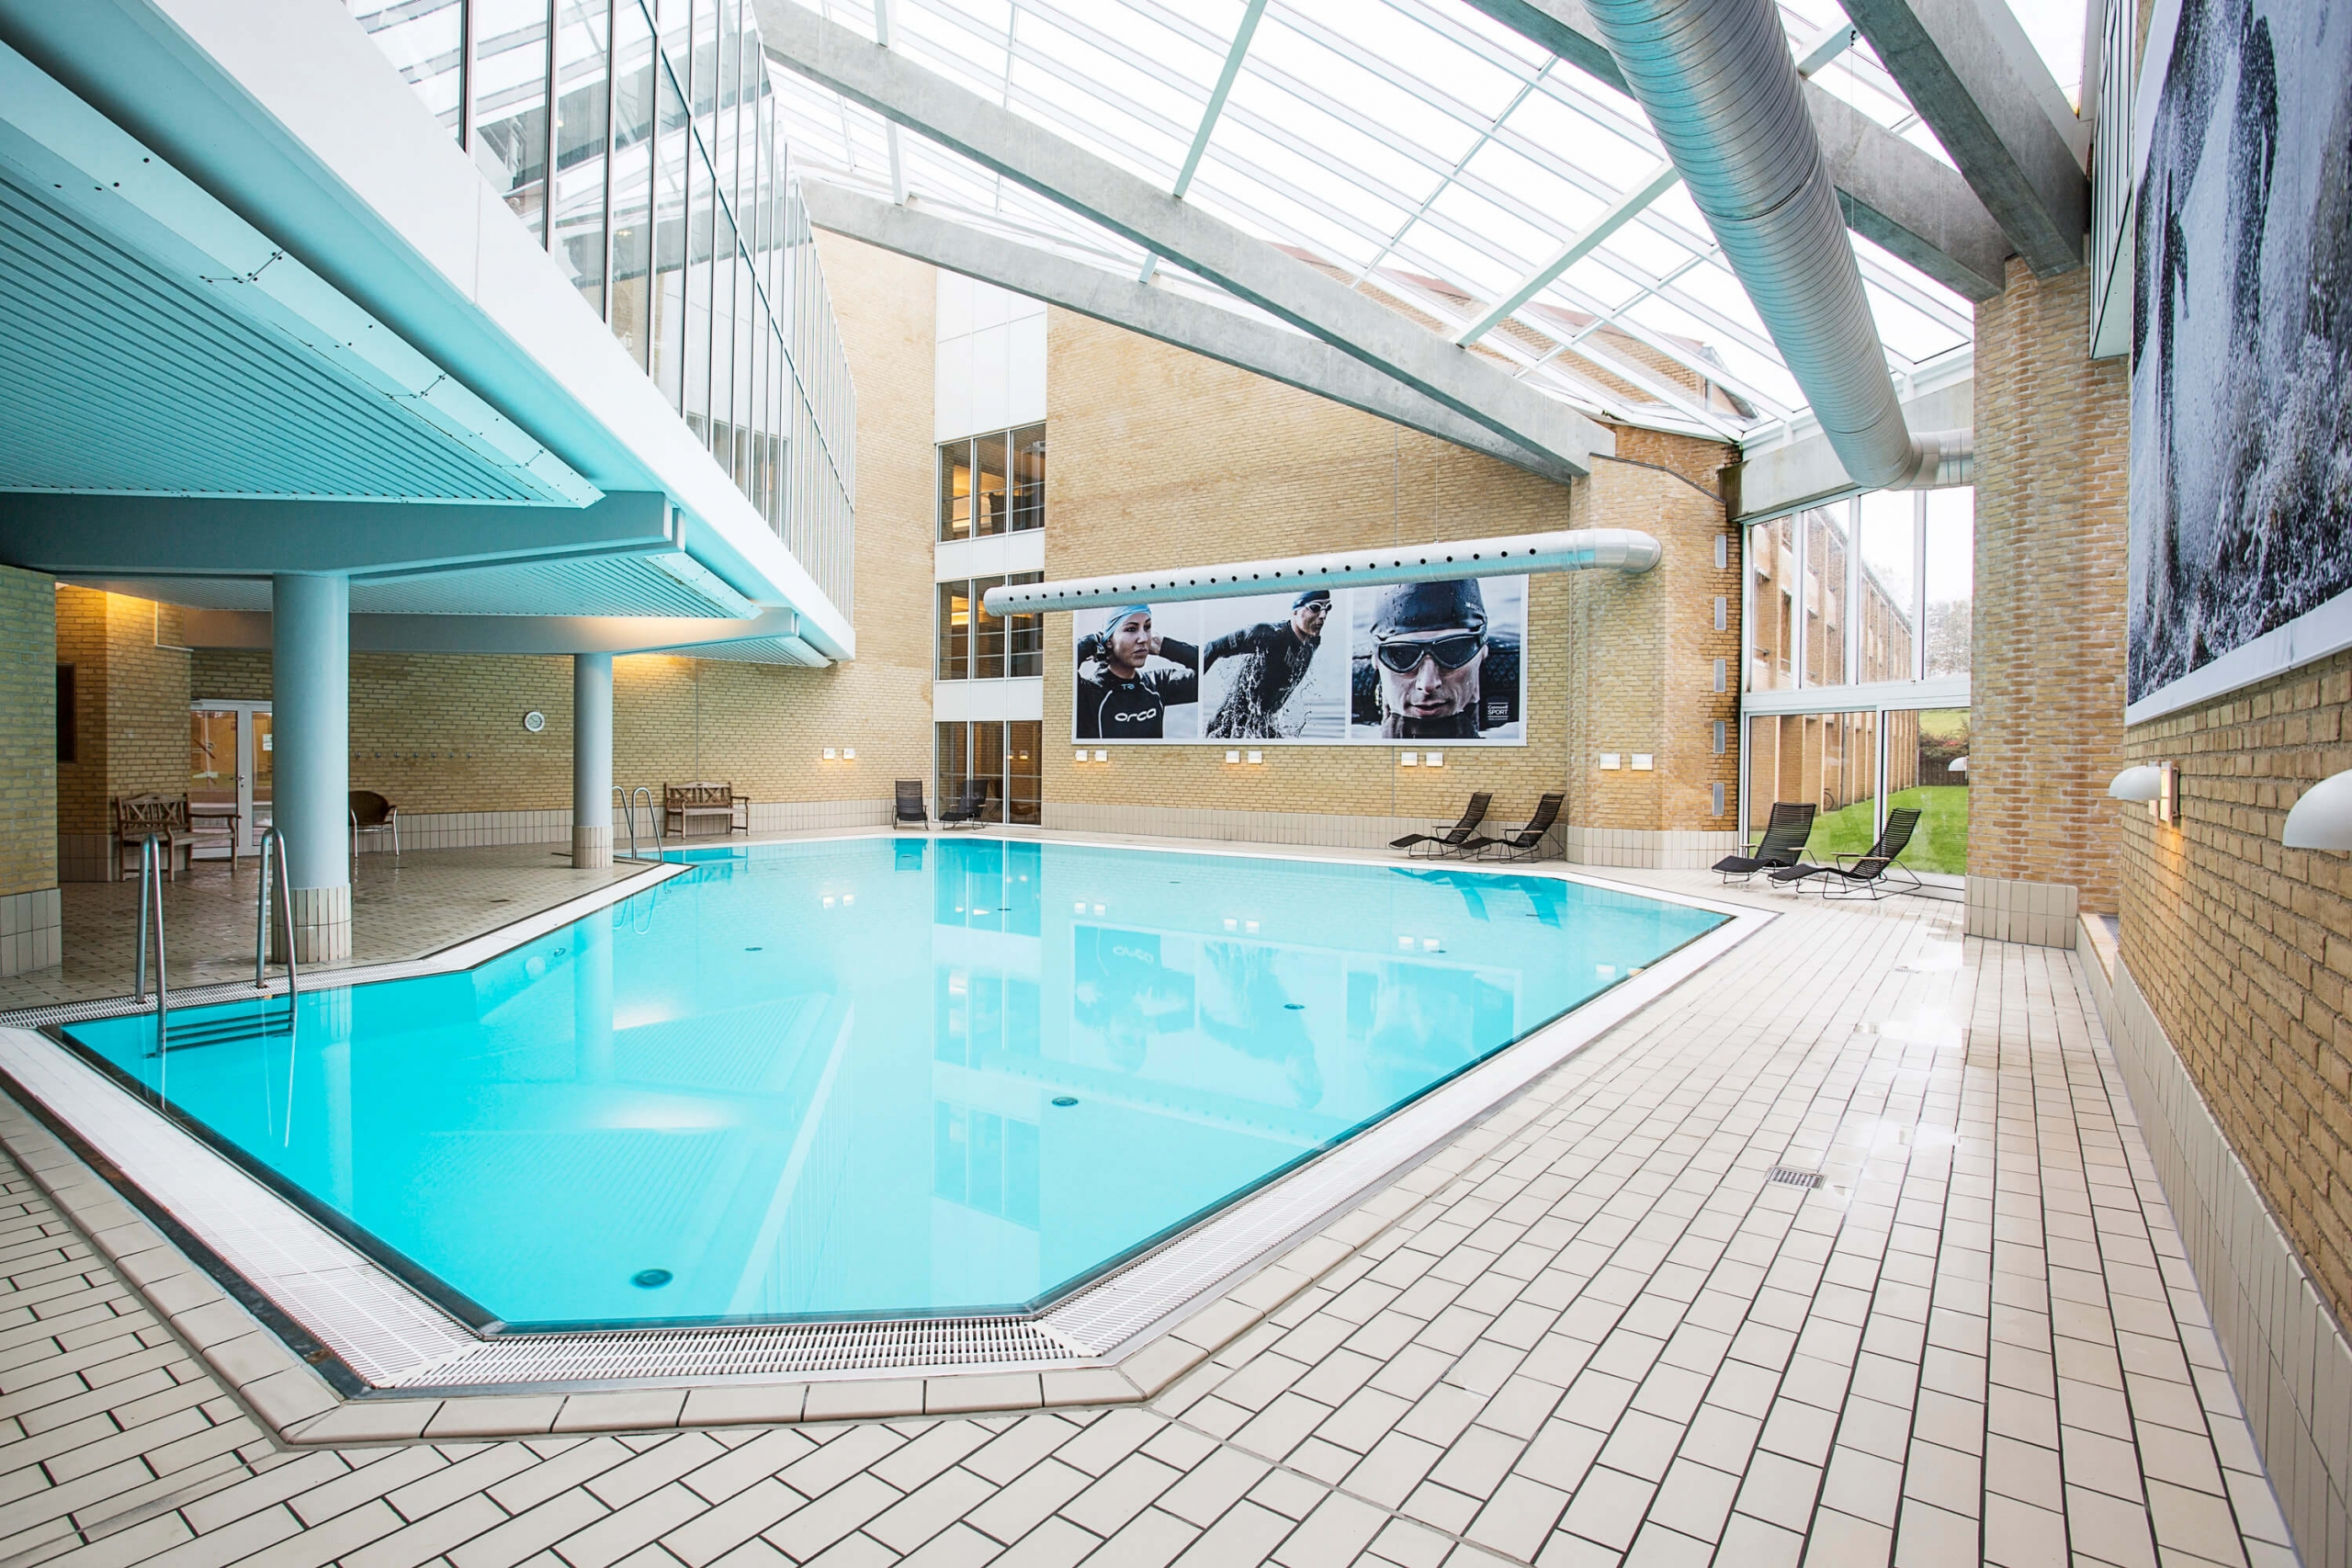 Comwell Rebildbakker, swimmingpool